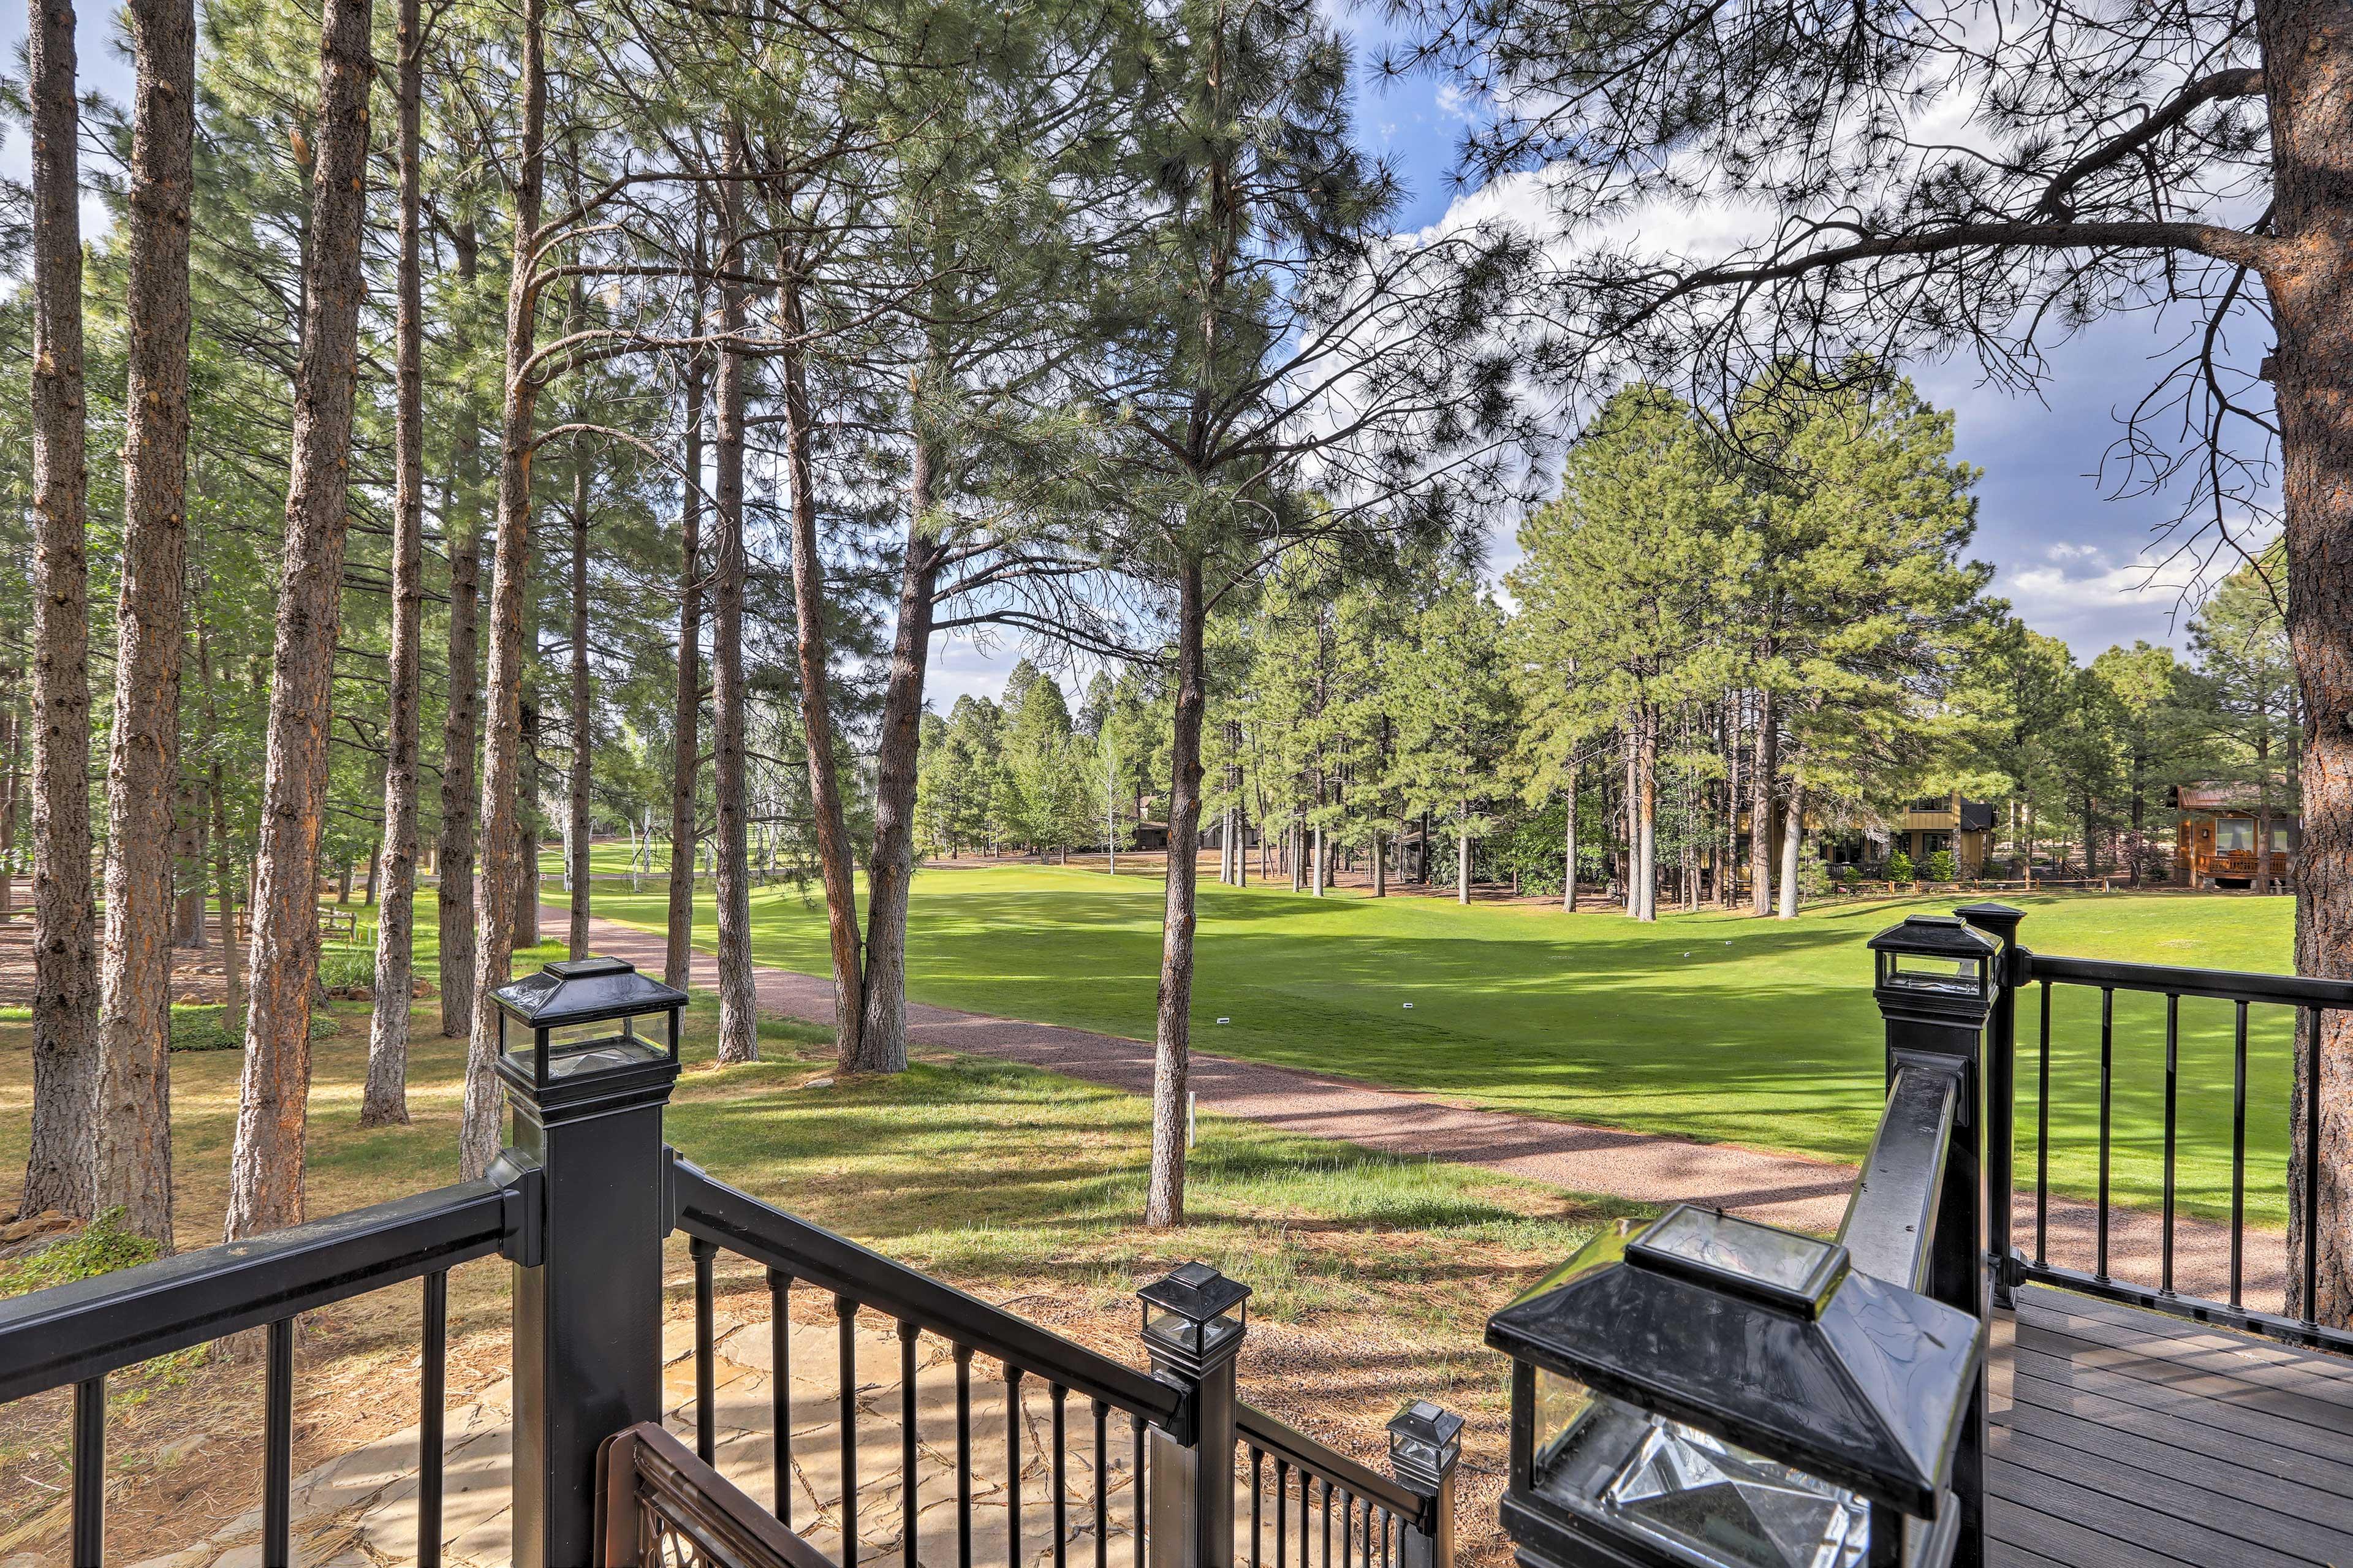 Enjoy views of the golf course.